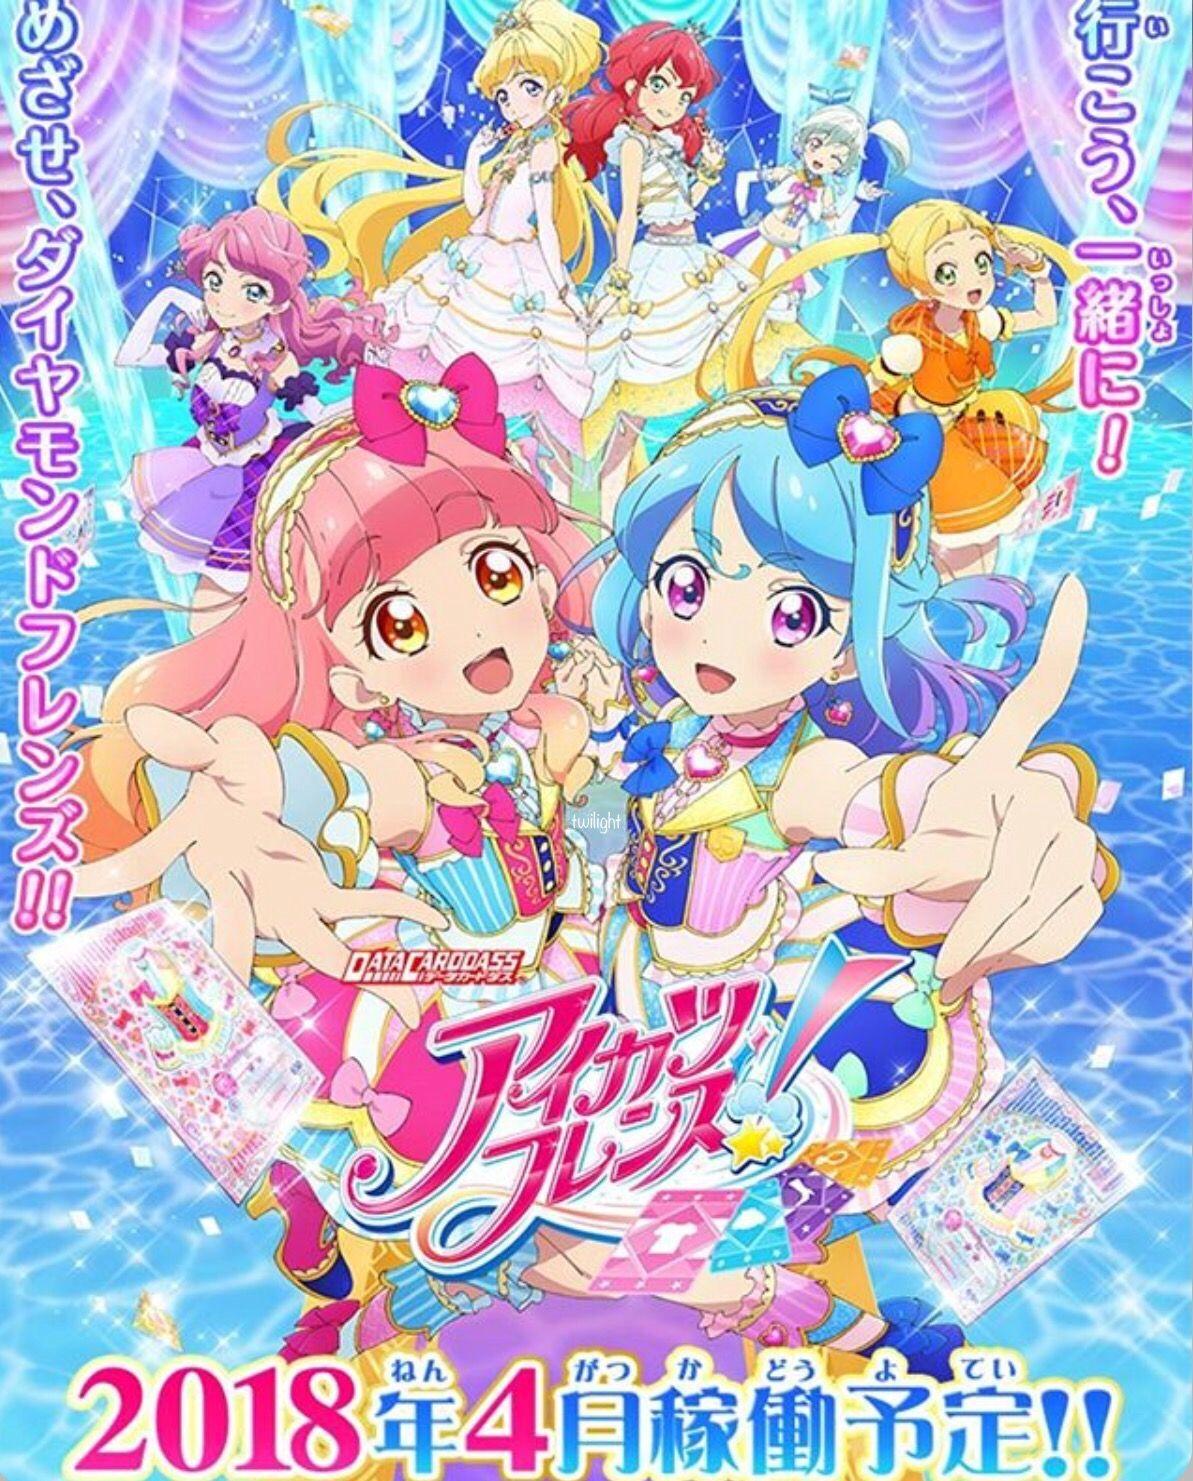 Aikatsu Stars! Season 3?